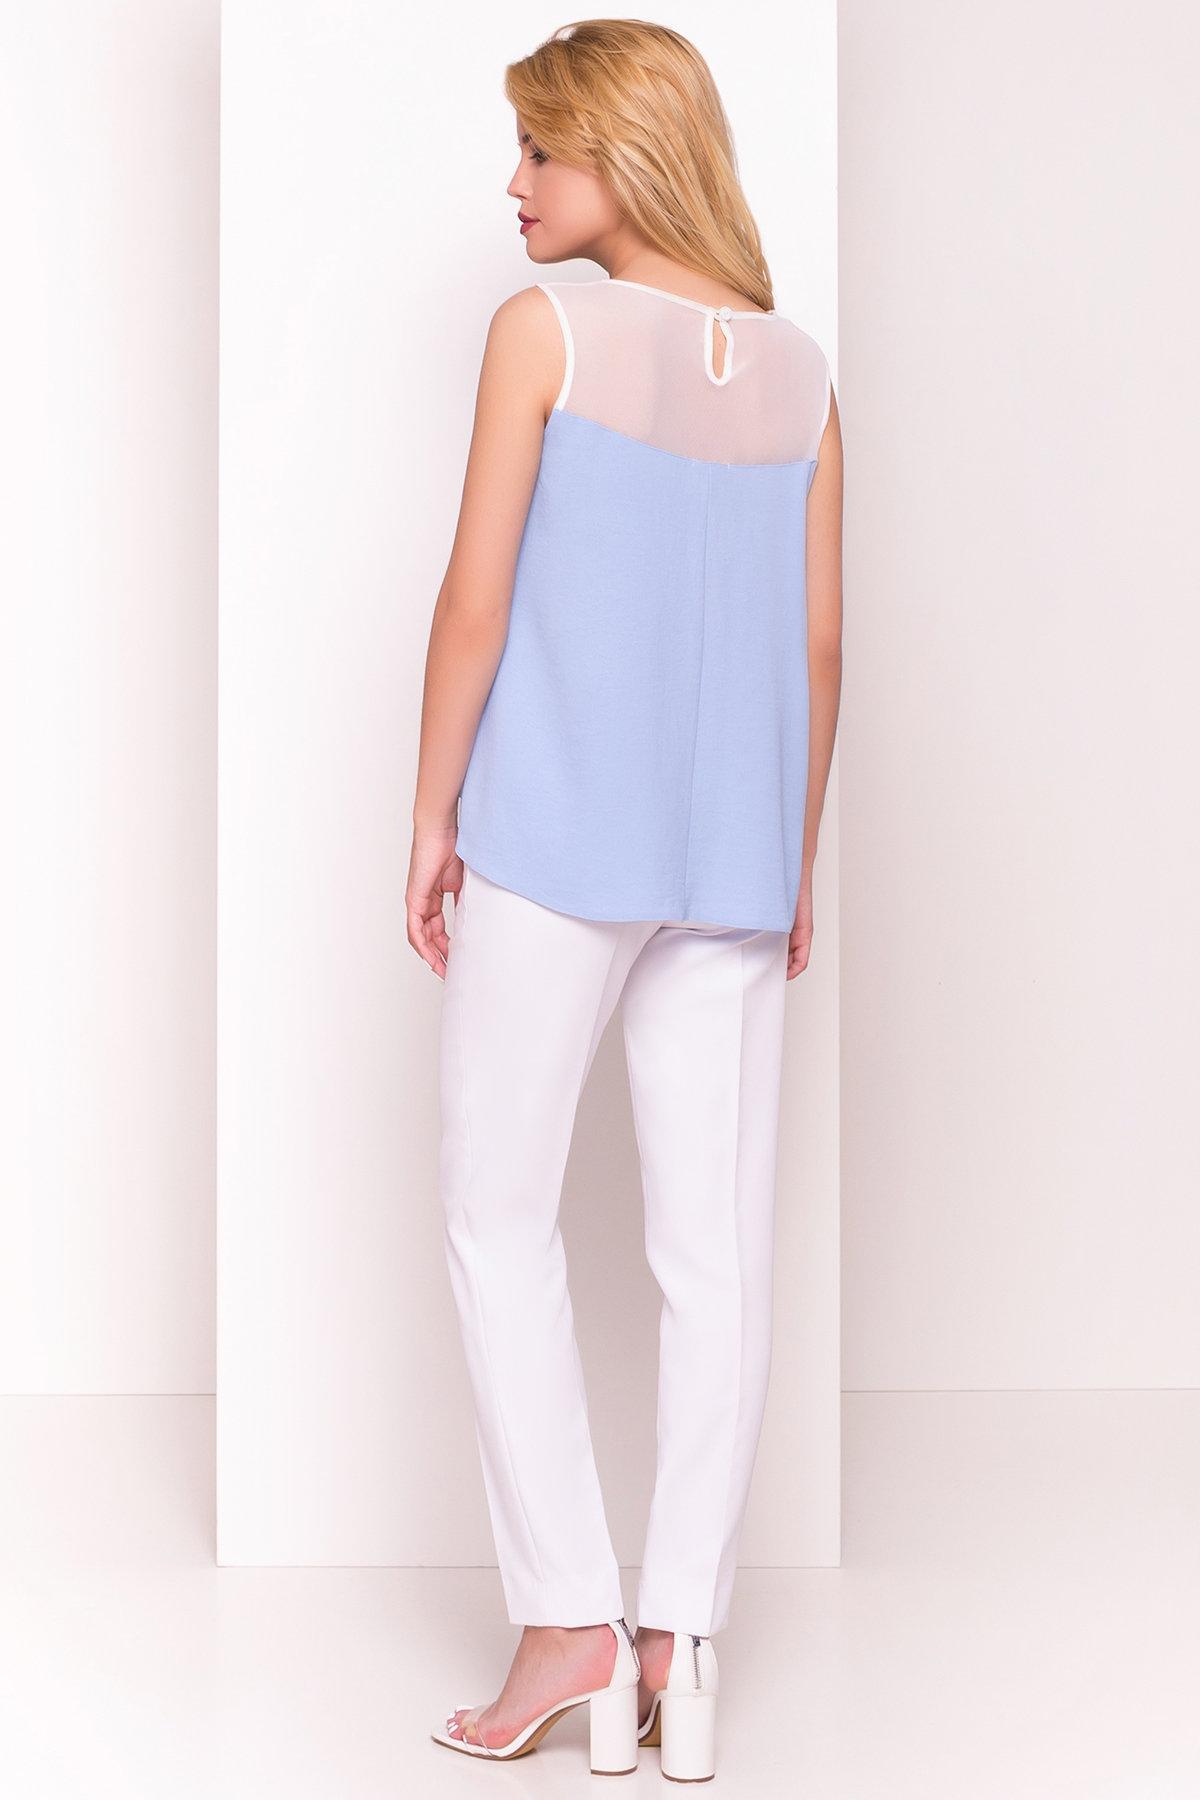 Летняя блуза без рукавов Нелли 4918 Цвет: Голубой